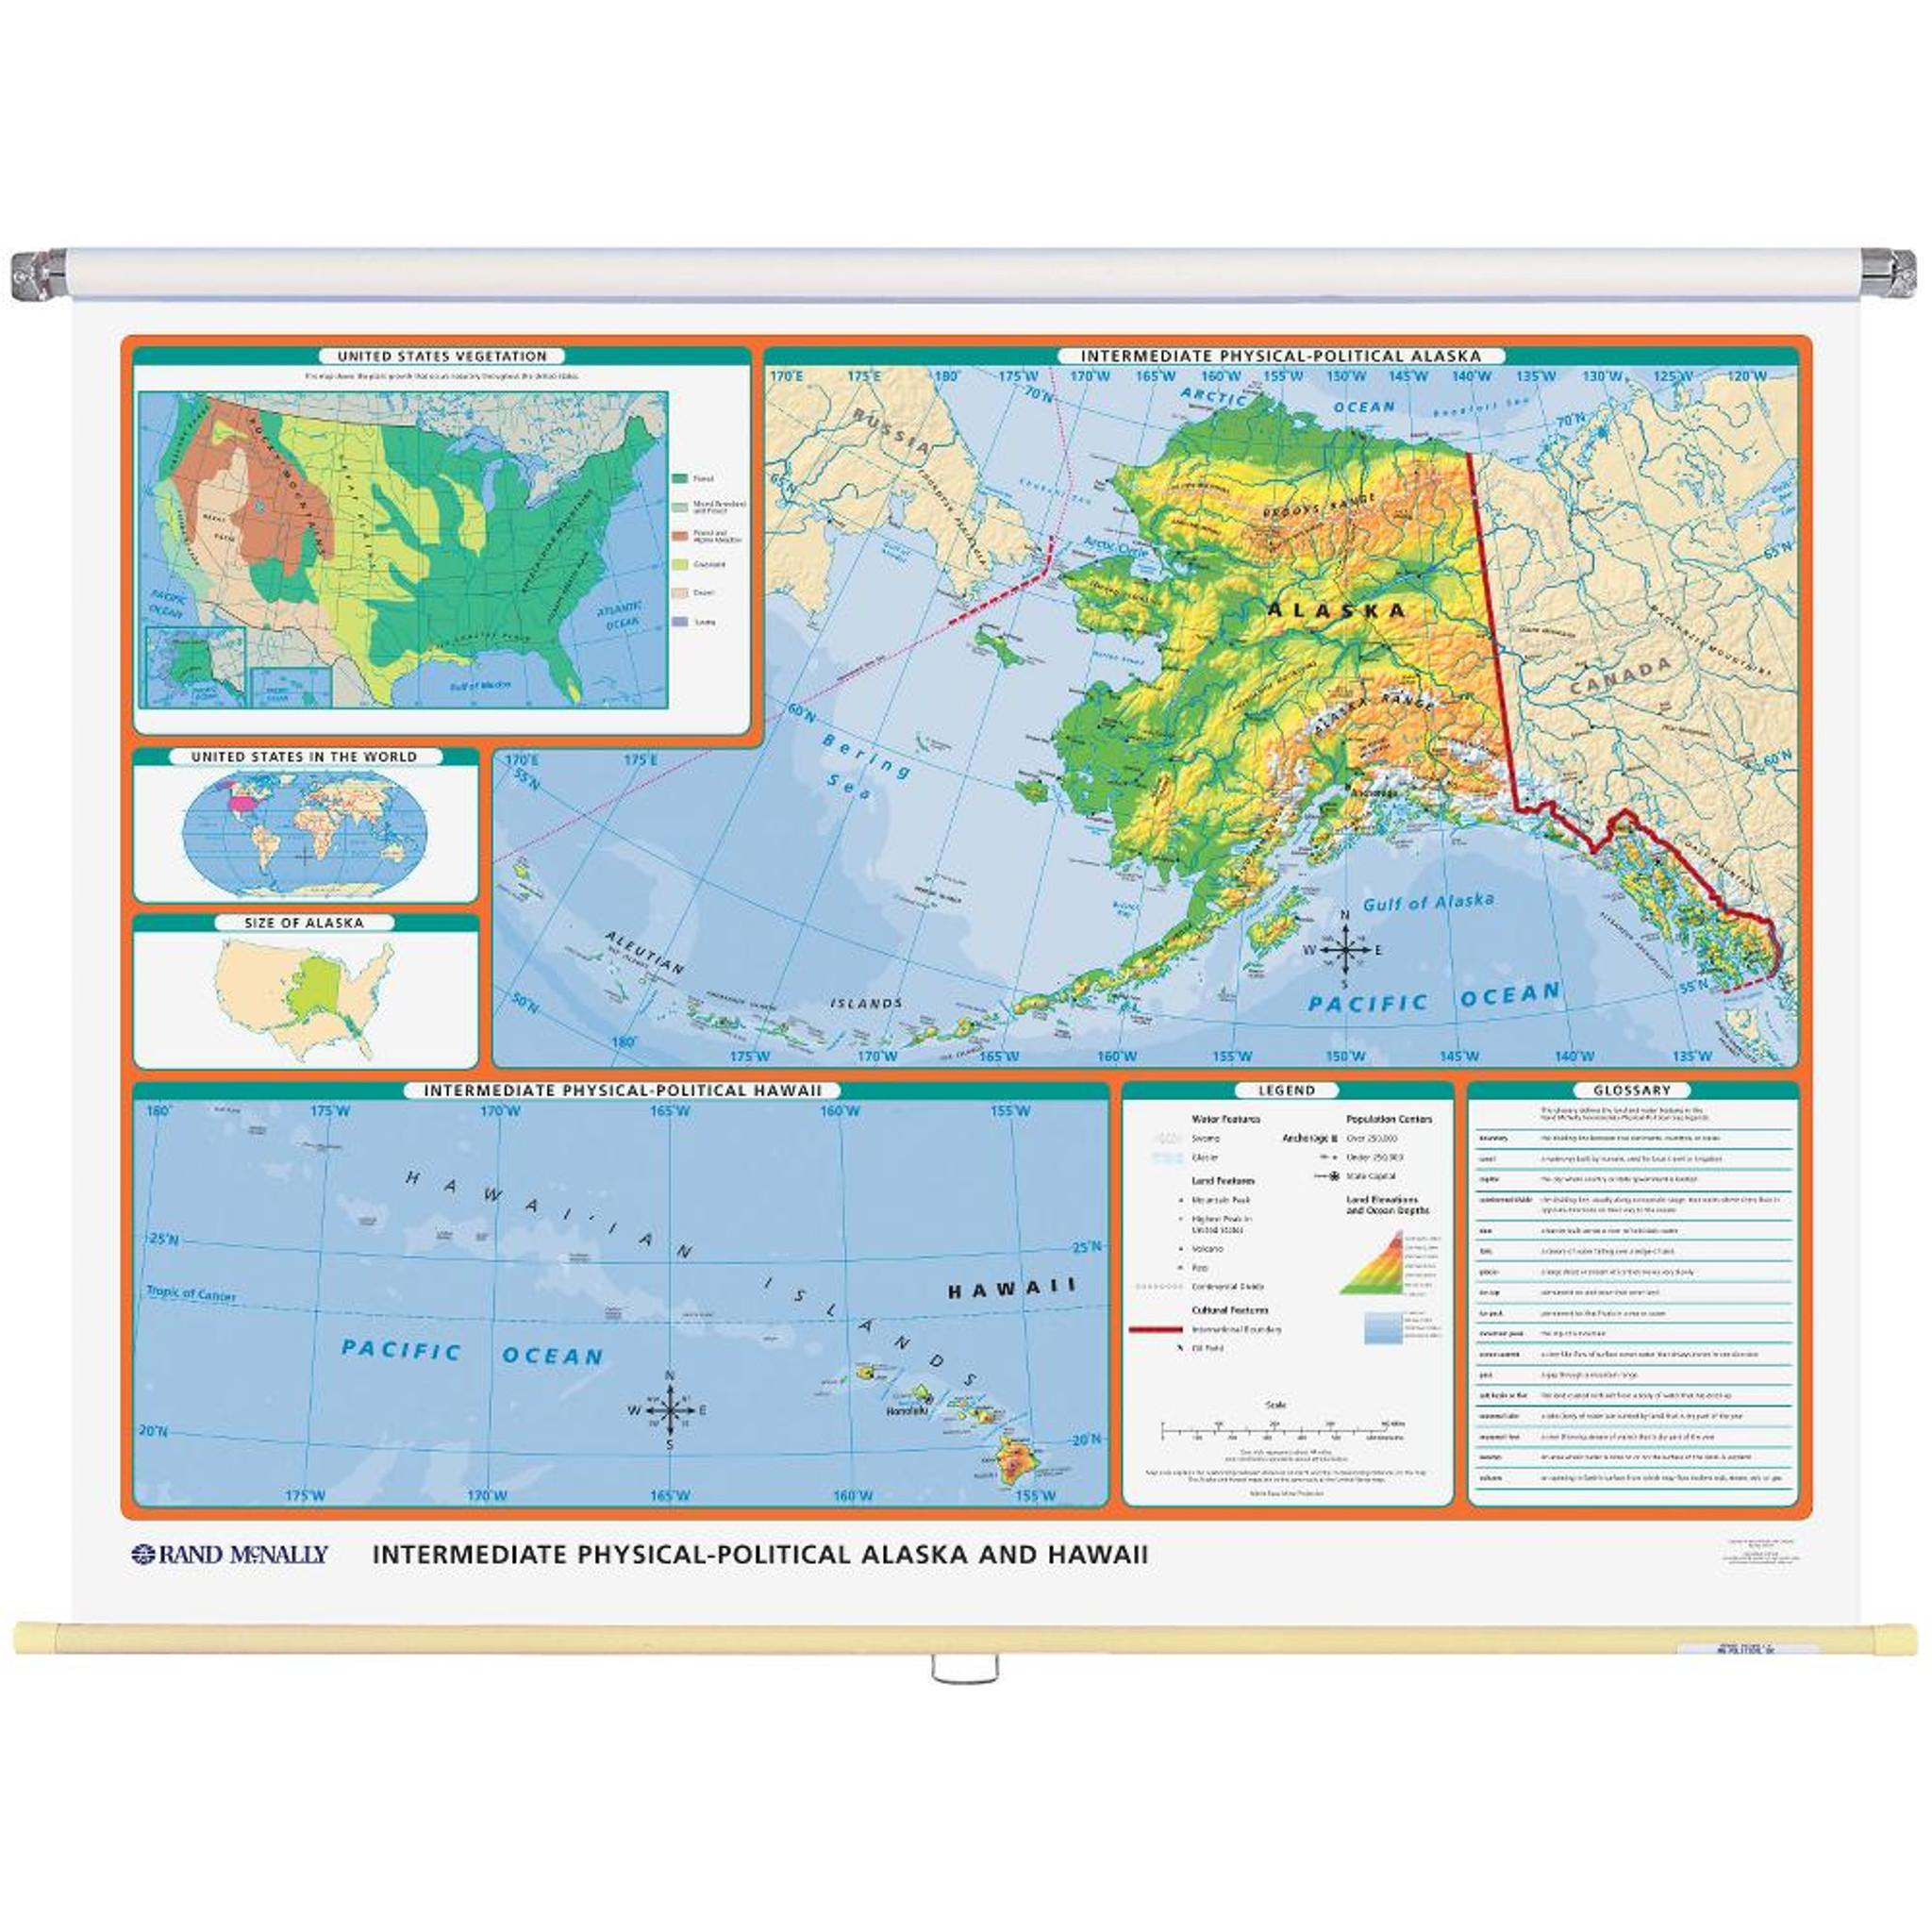 Alaska Physical-Political State Wall Map